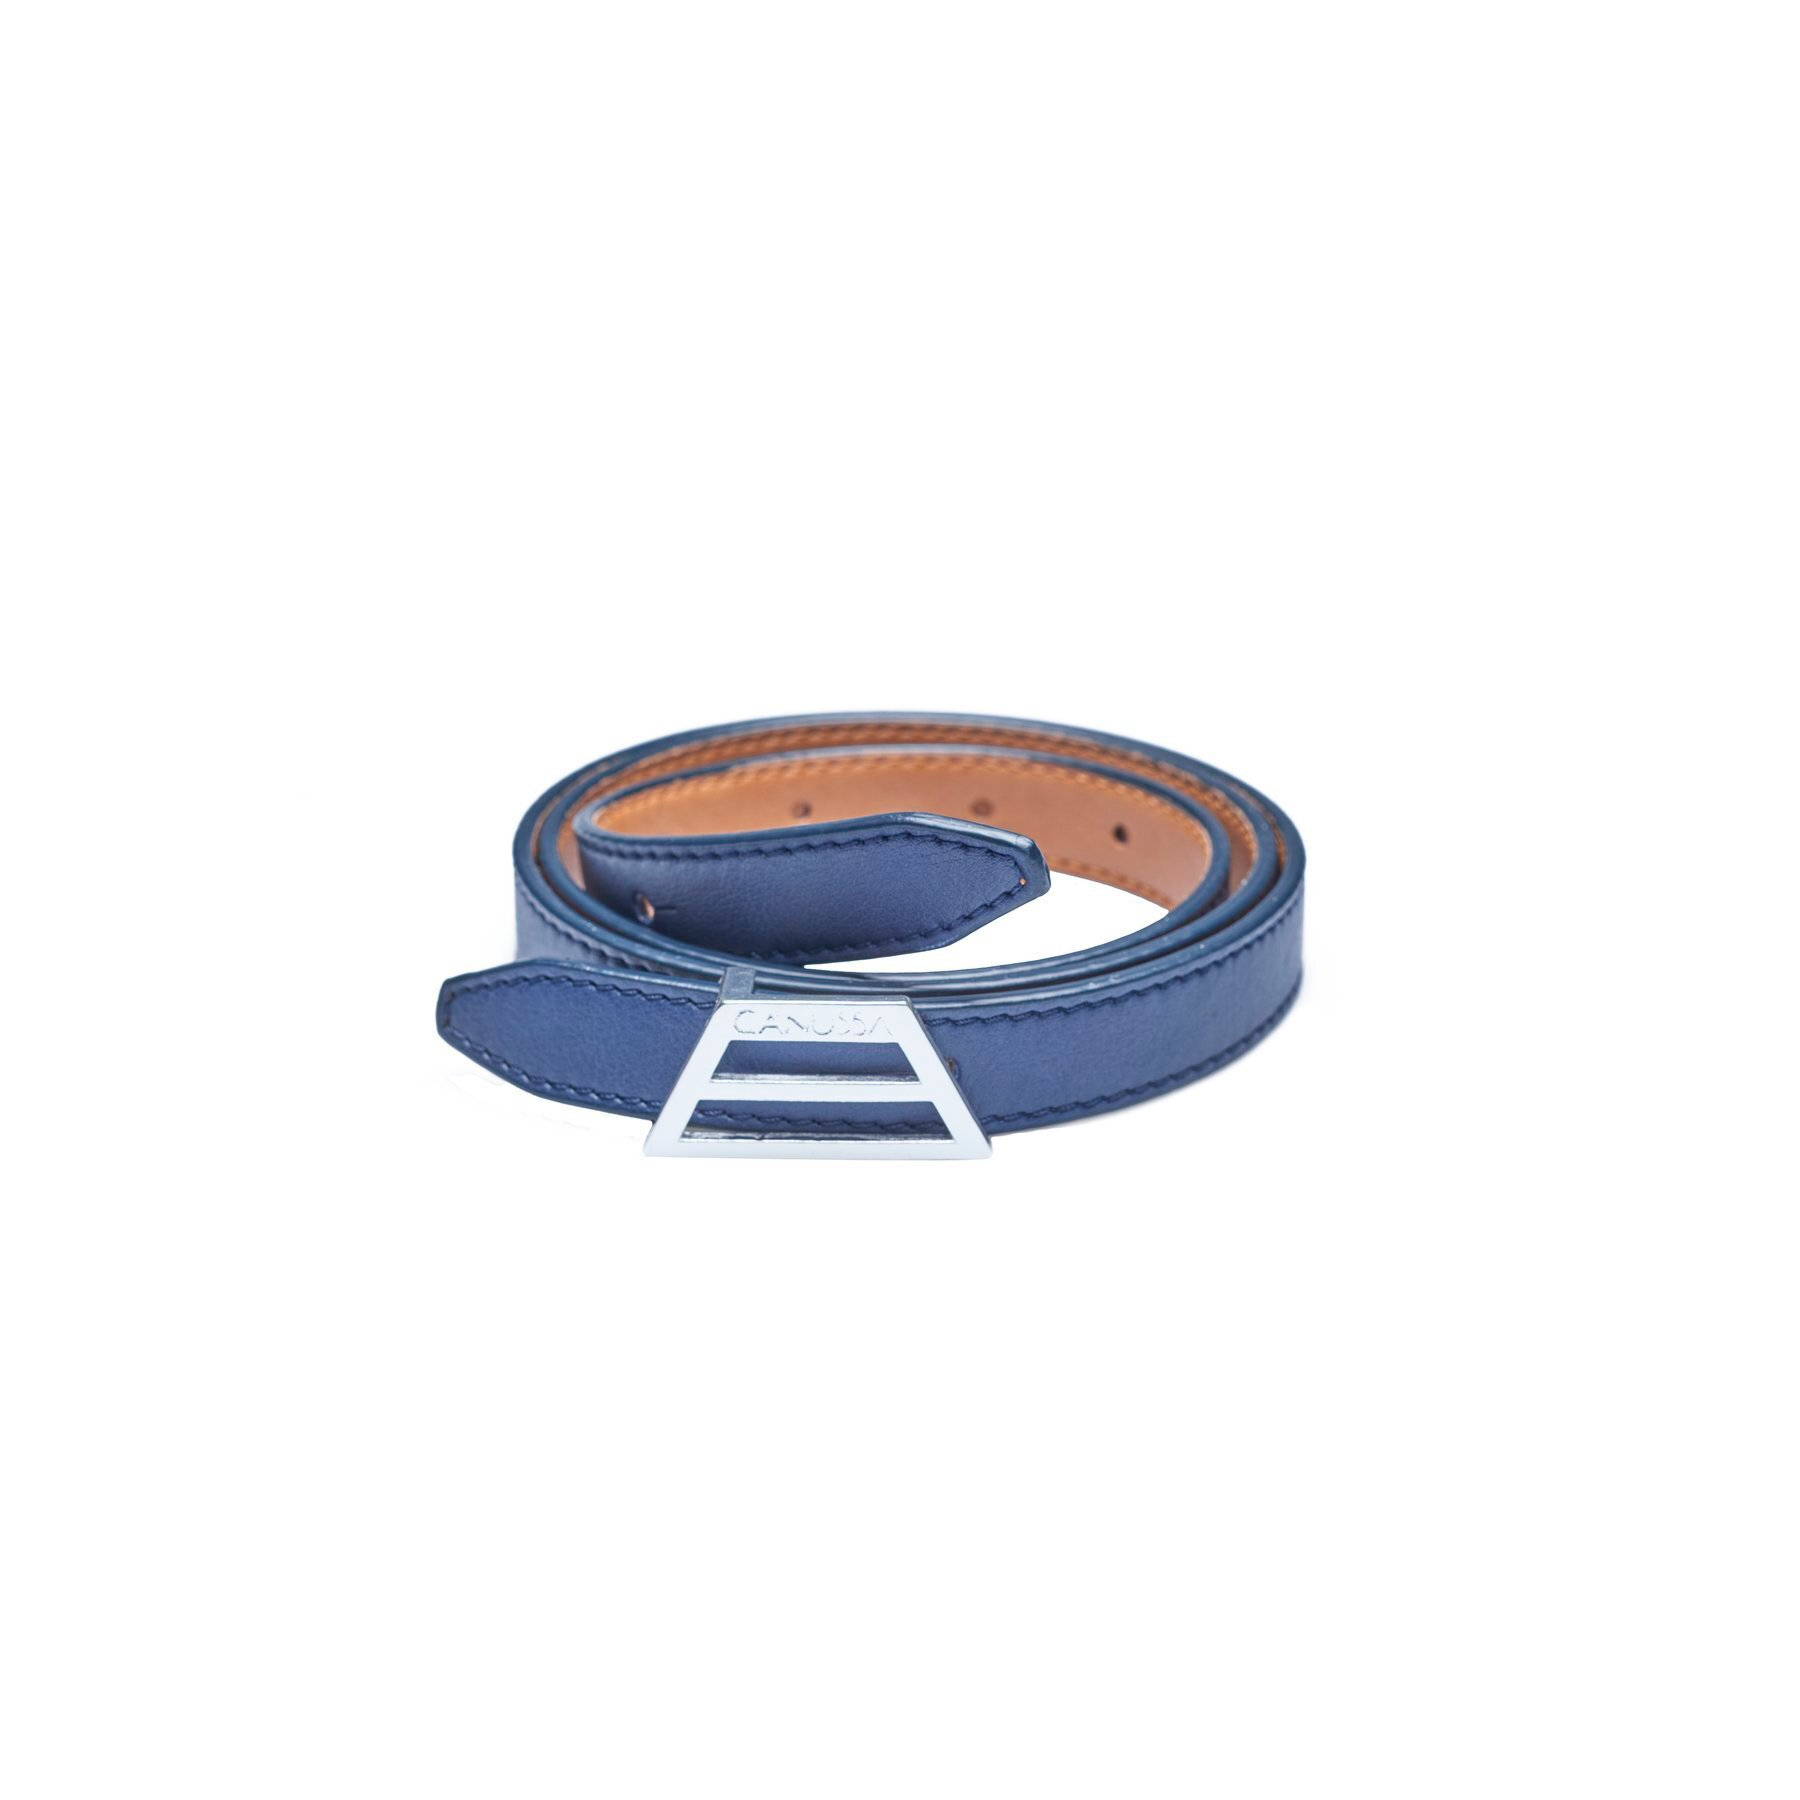 ADAPT Vegan Belt – Reversible Camel/Blue